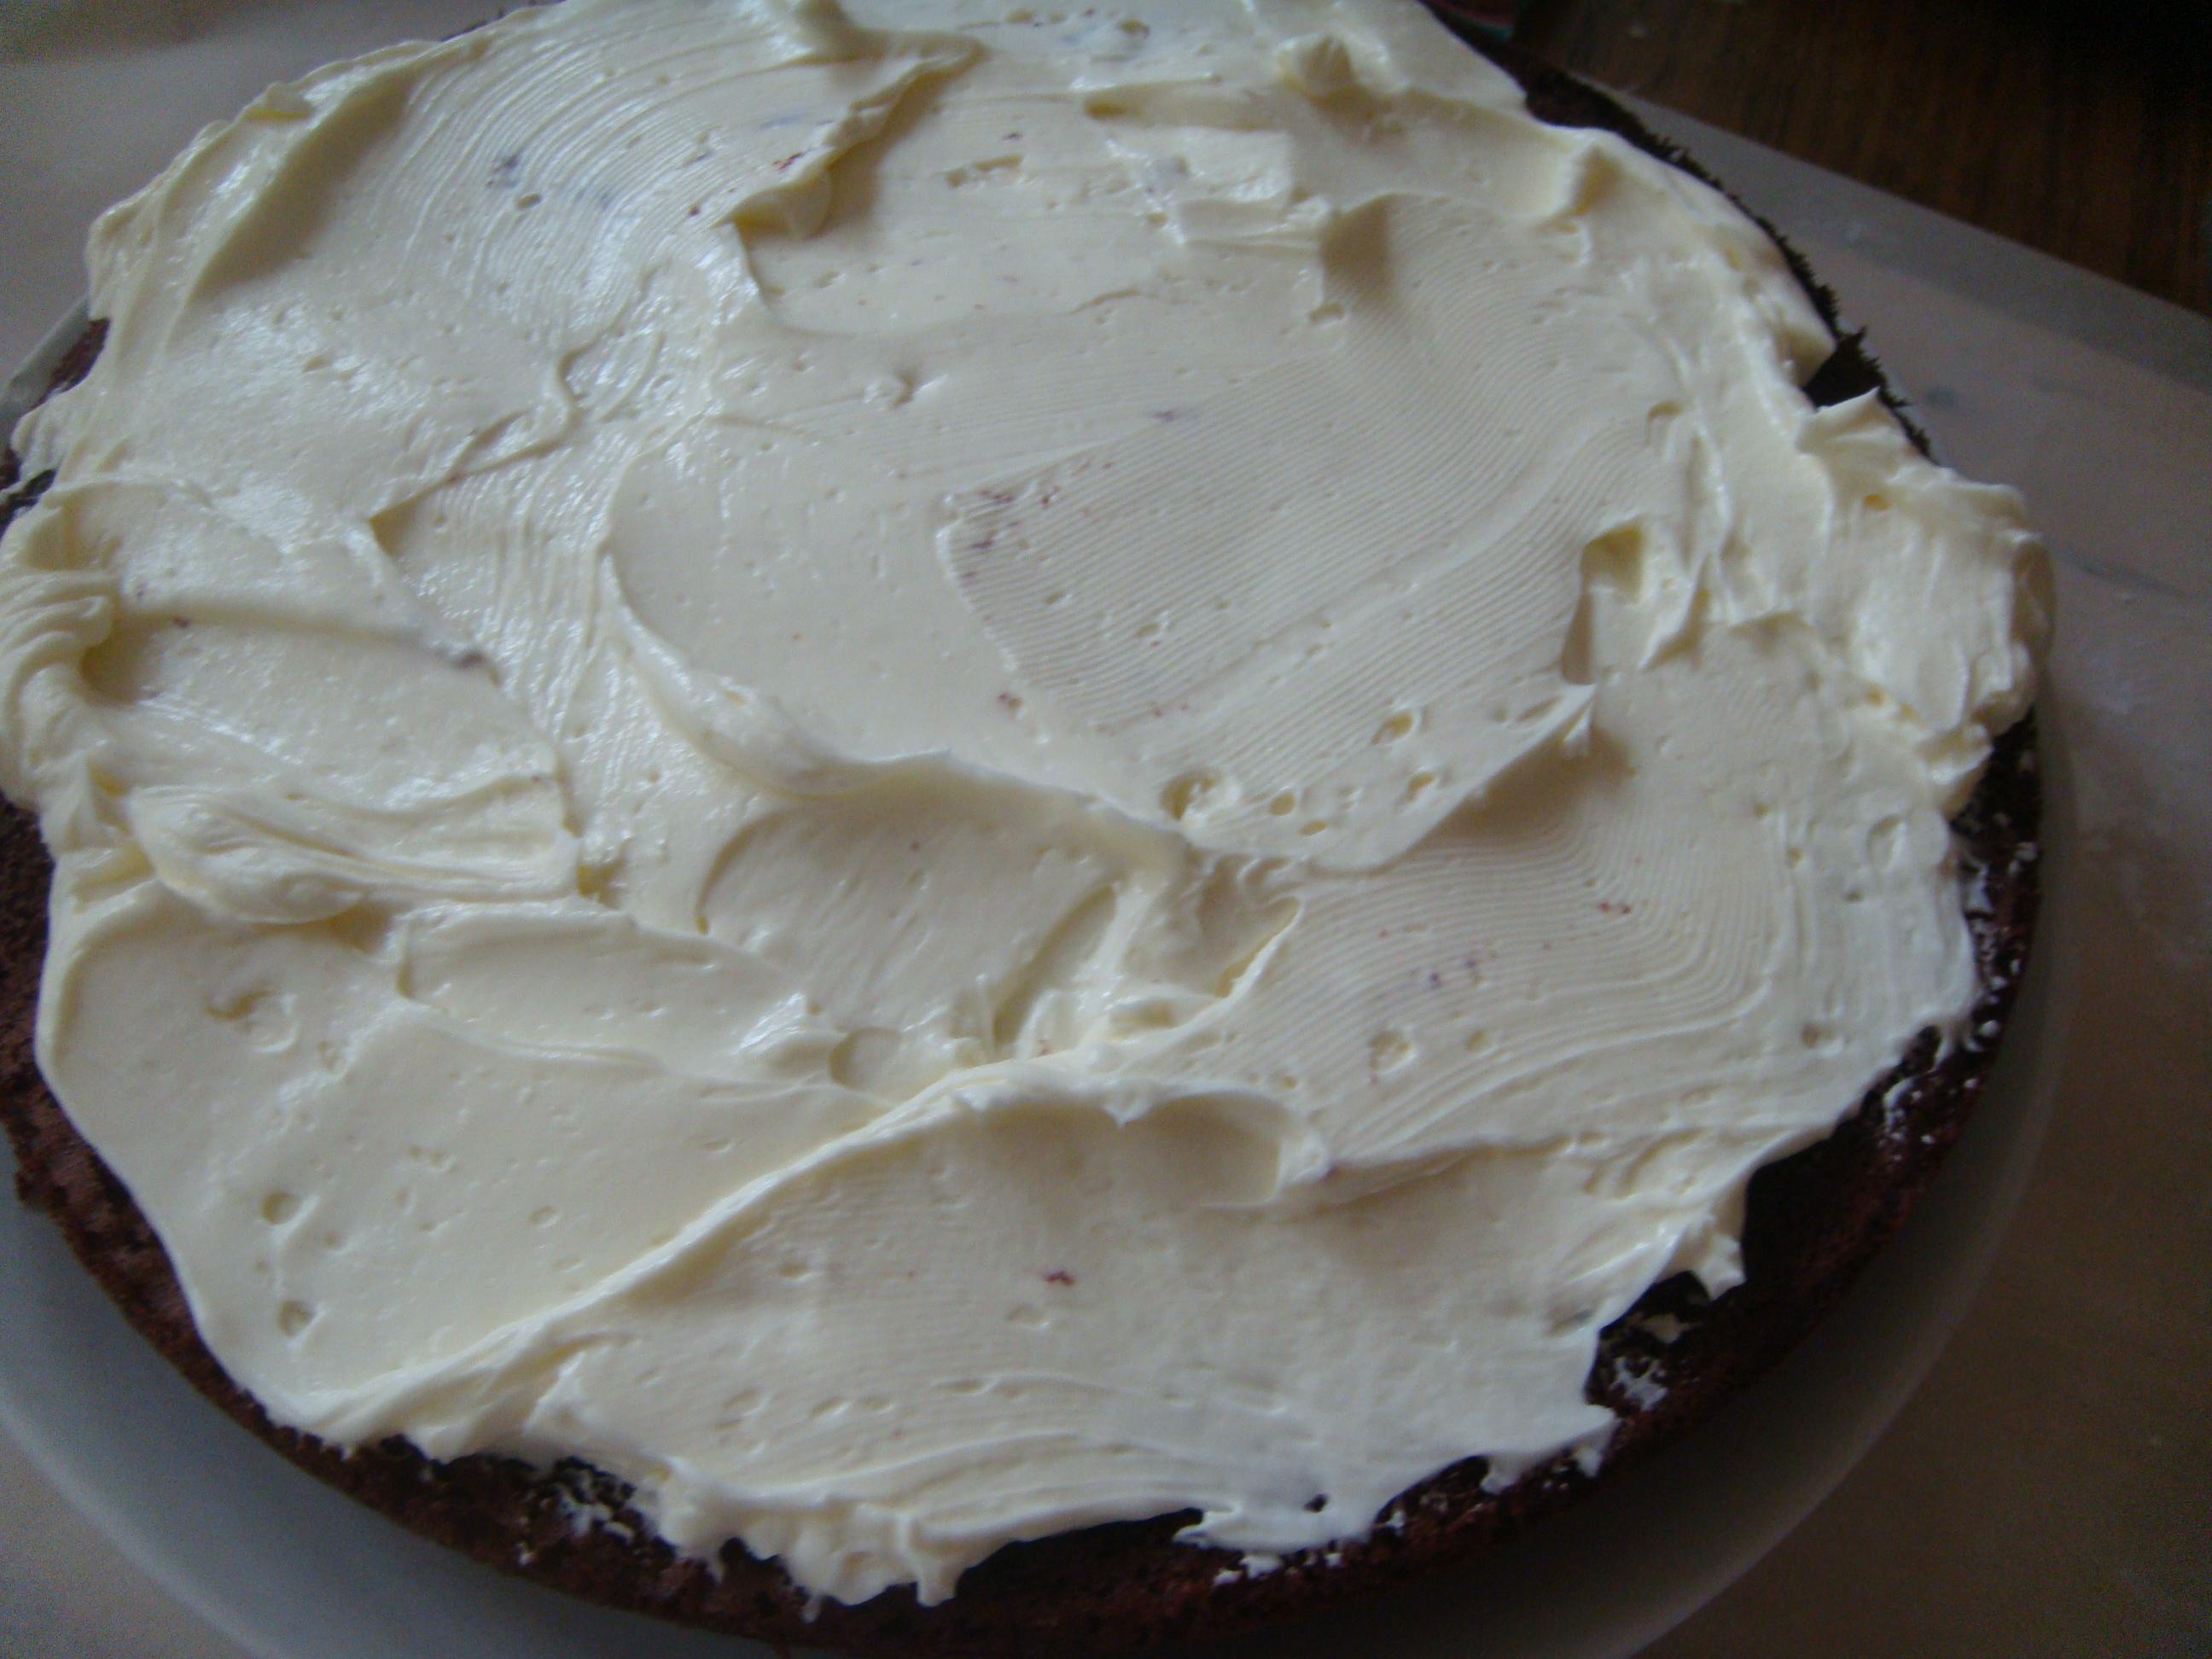 Layering cake with marscopone icing